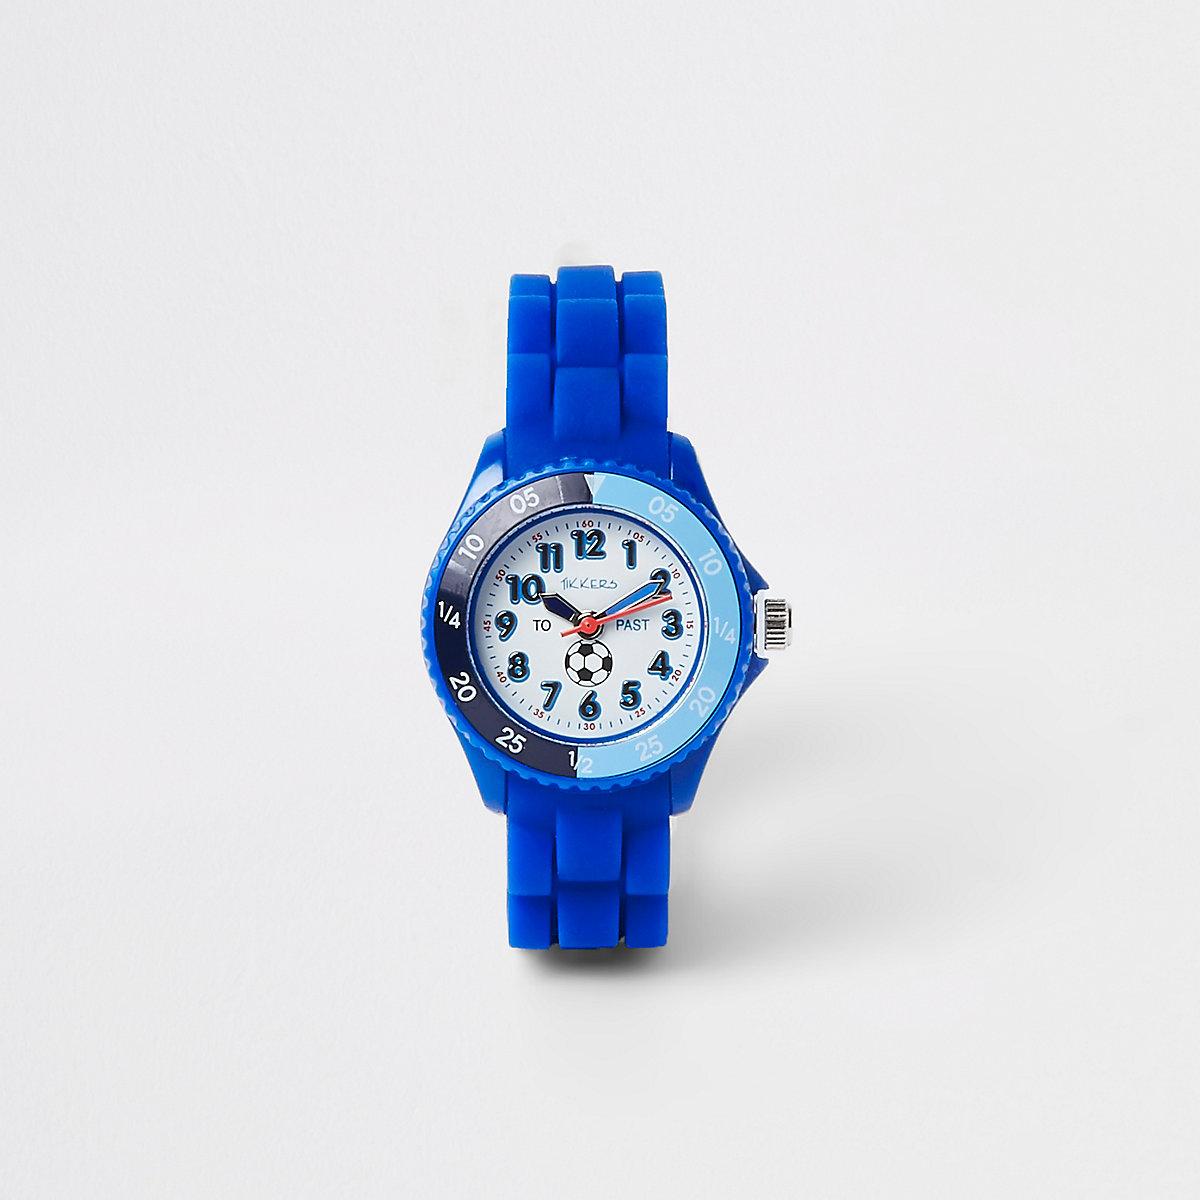 Blaue, sportliche Armbanduhr mit Gummiarmband